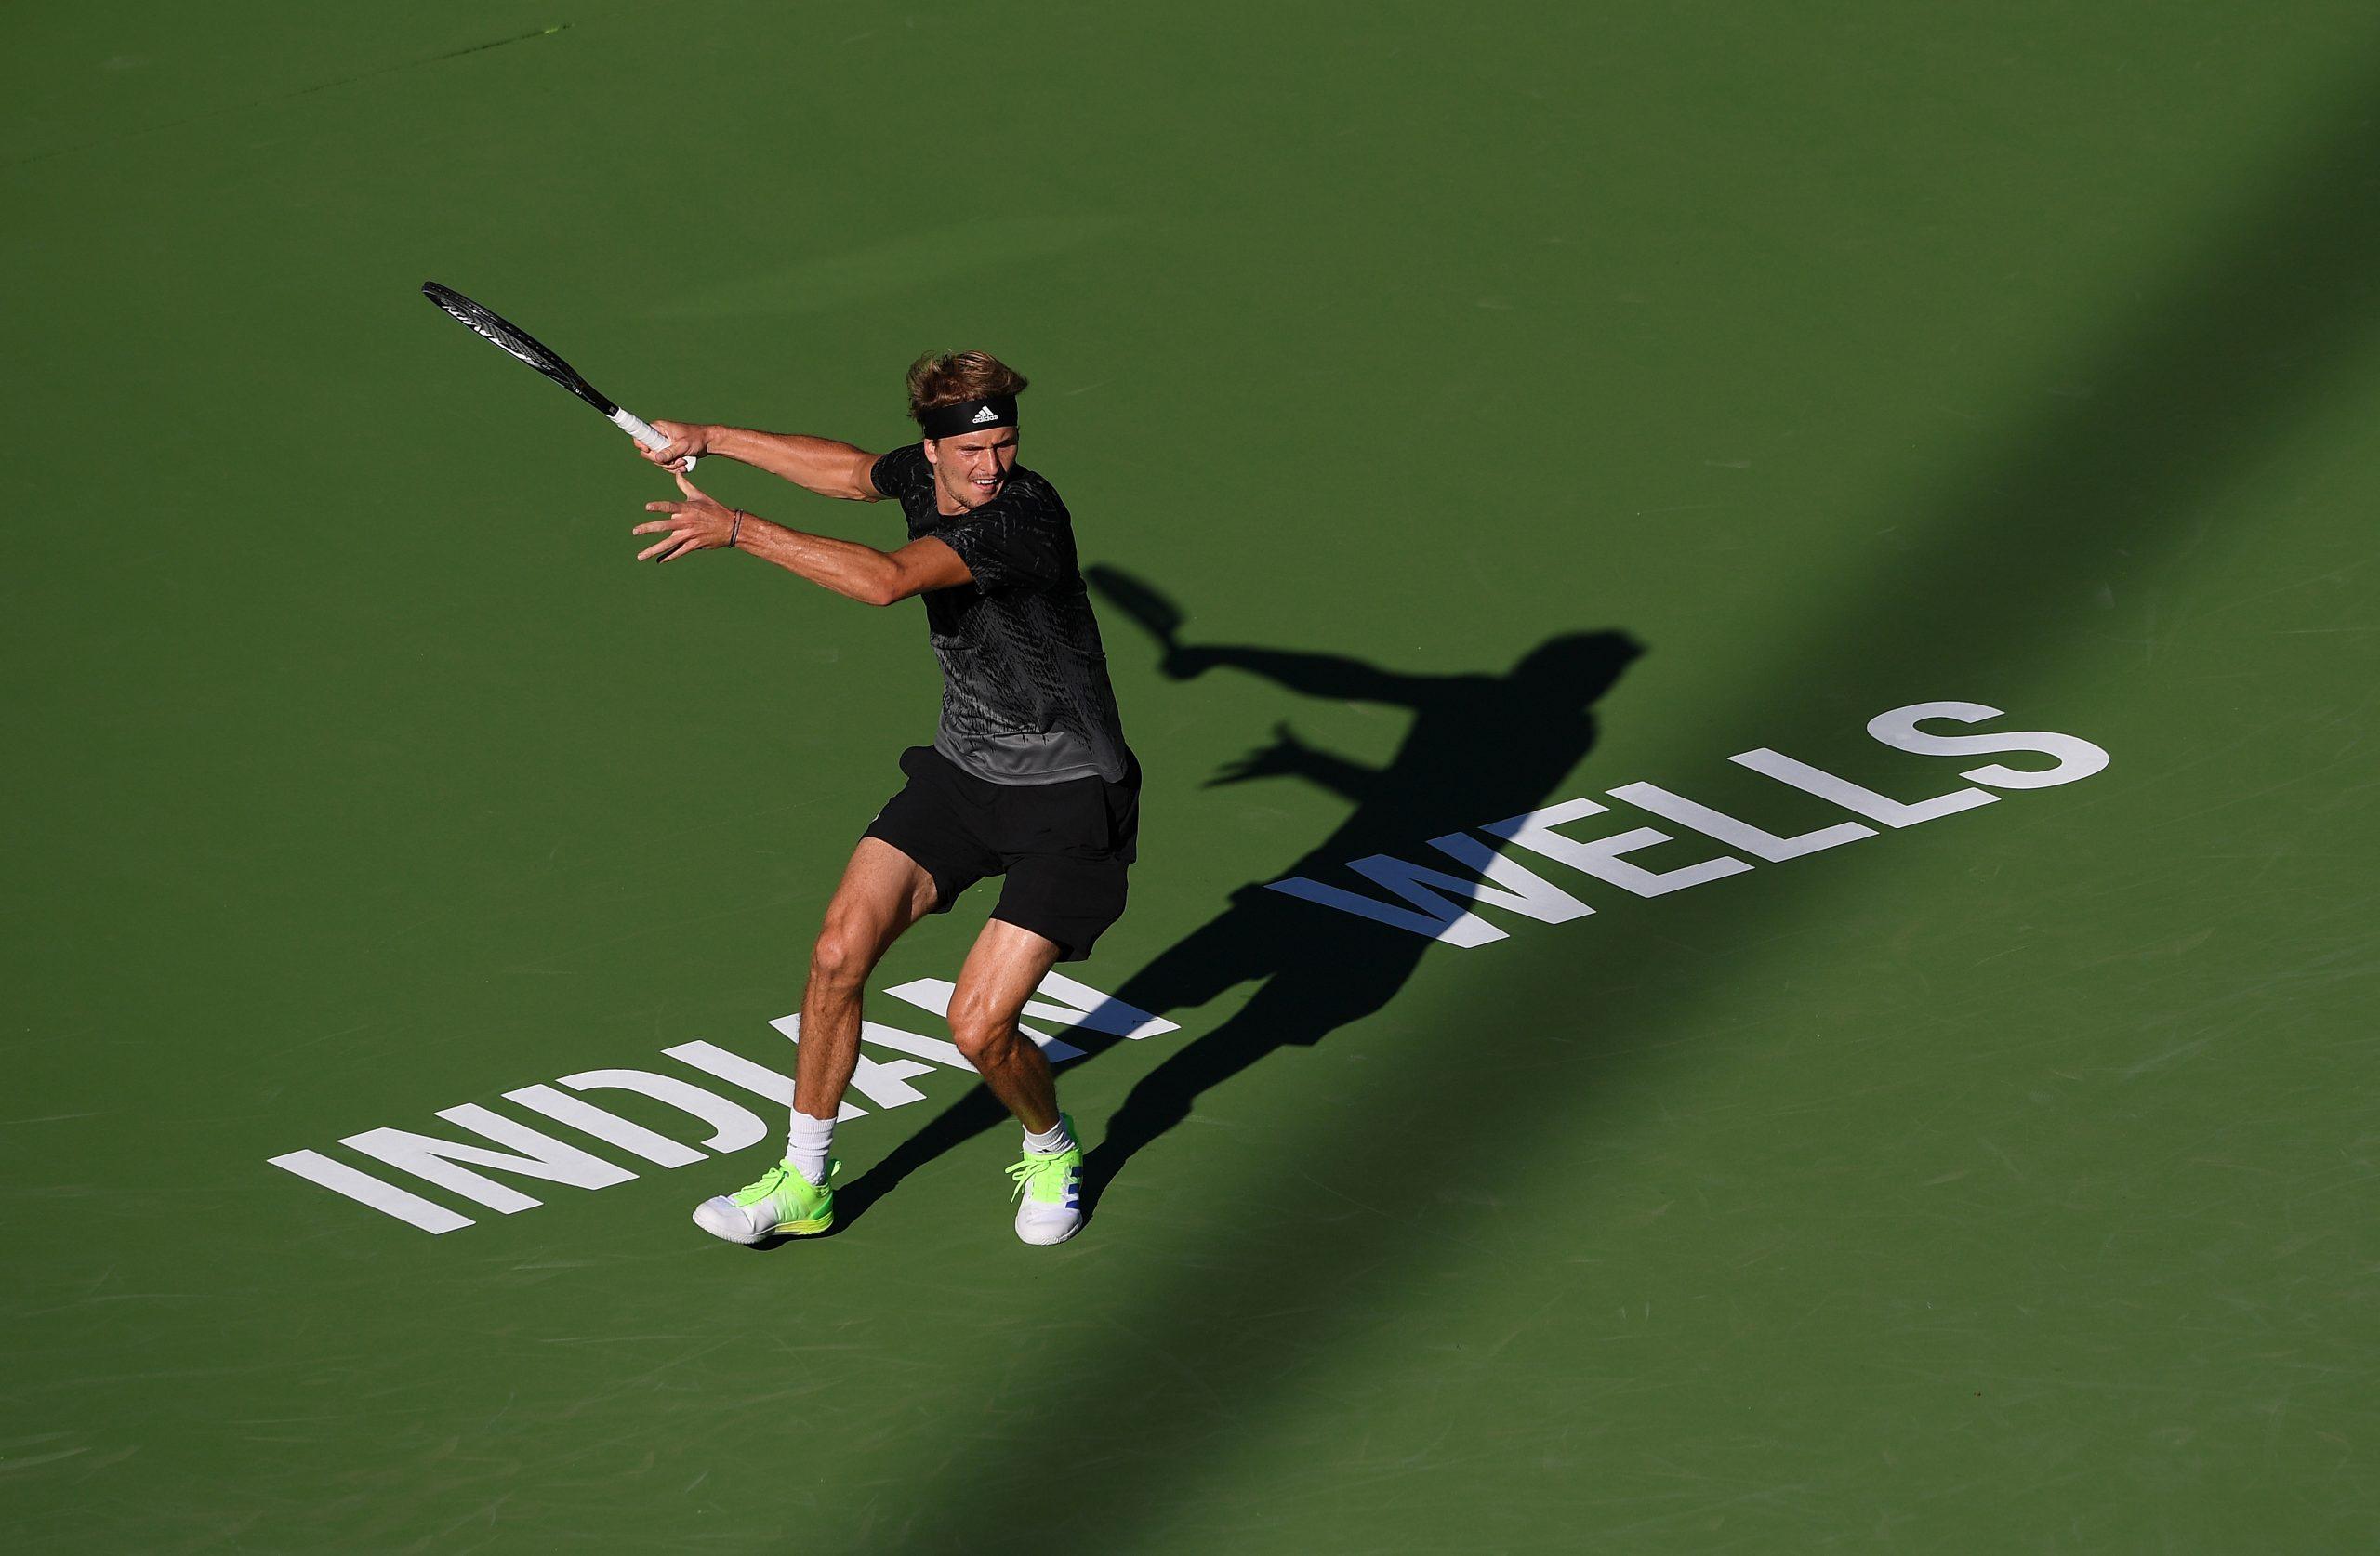 S554WWPJL5NQRO6LLHPLRSEZII scaled - ATP Indian Wells: Zverev kot četrti na sklepni turnir sezone v Torinu